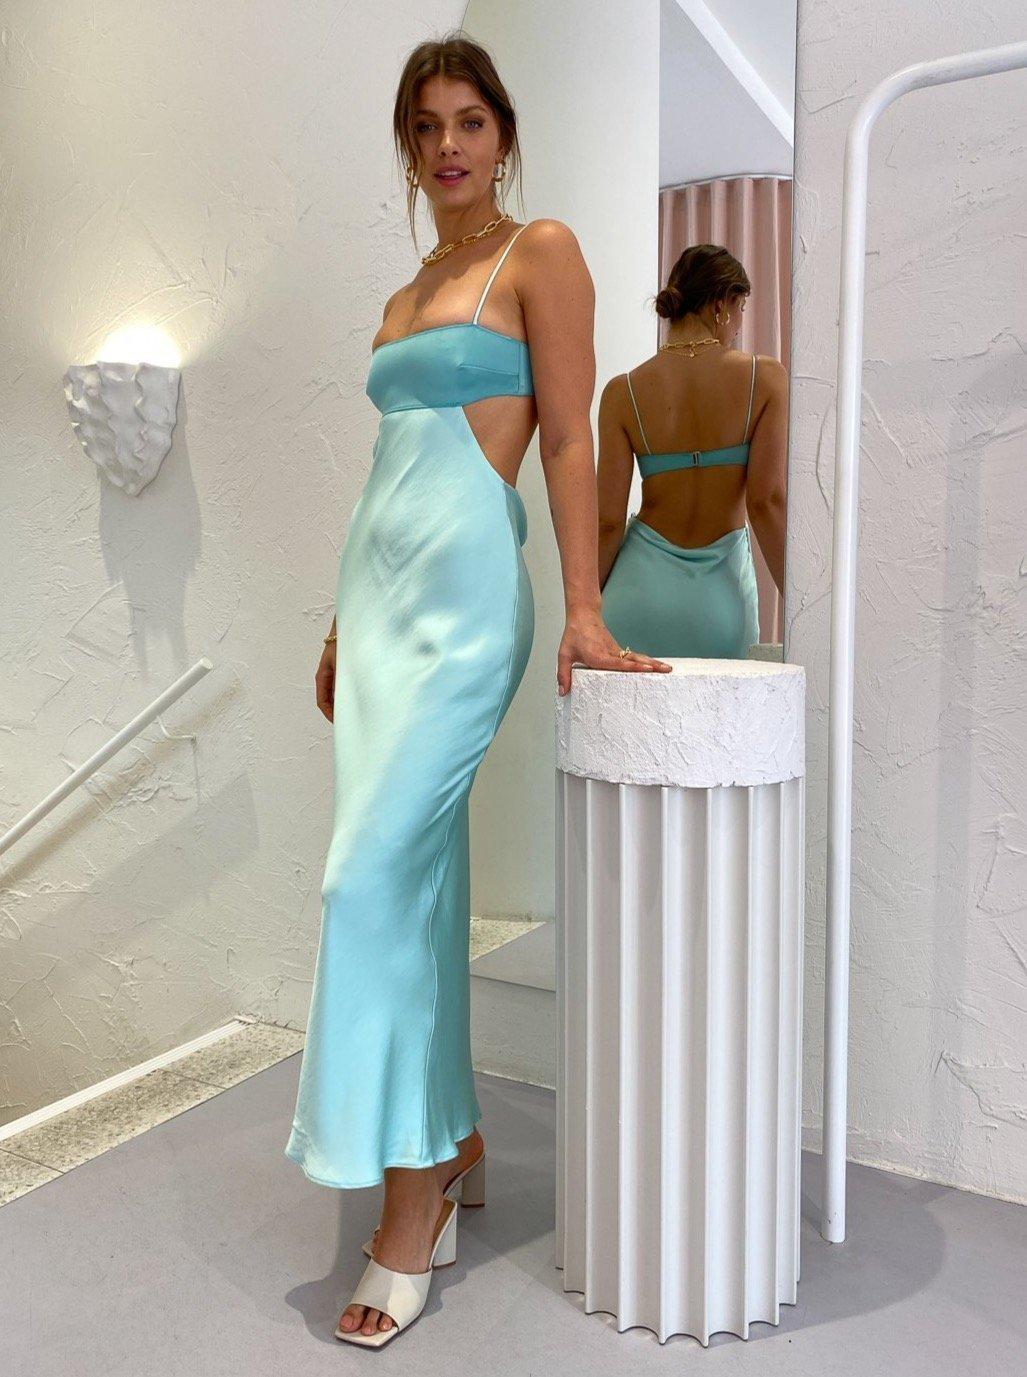 Acler Black/Nude Burton Lace Dress Size 12 | The Volte